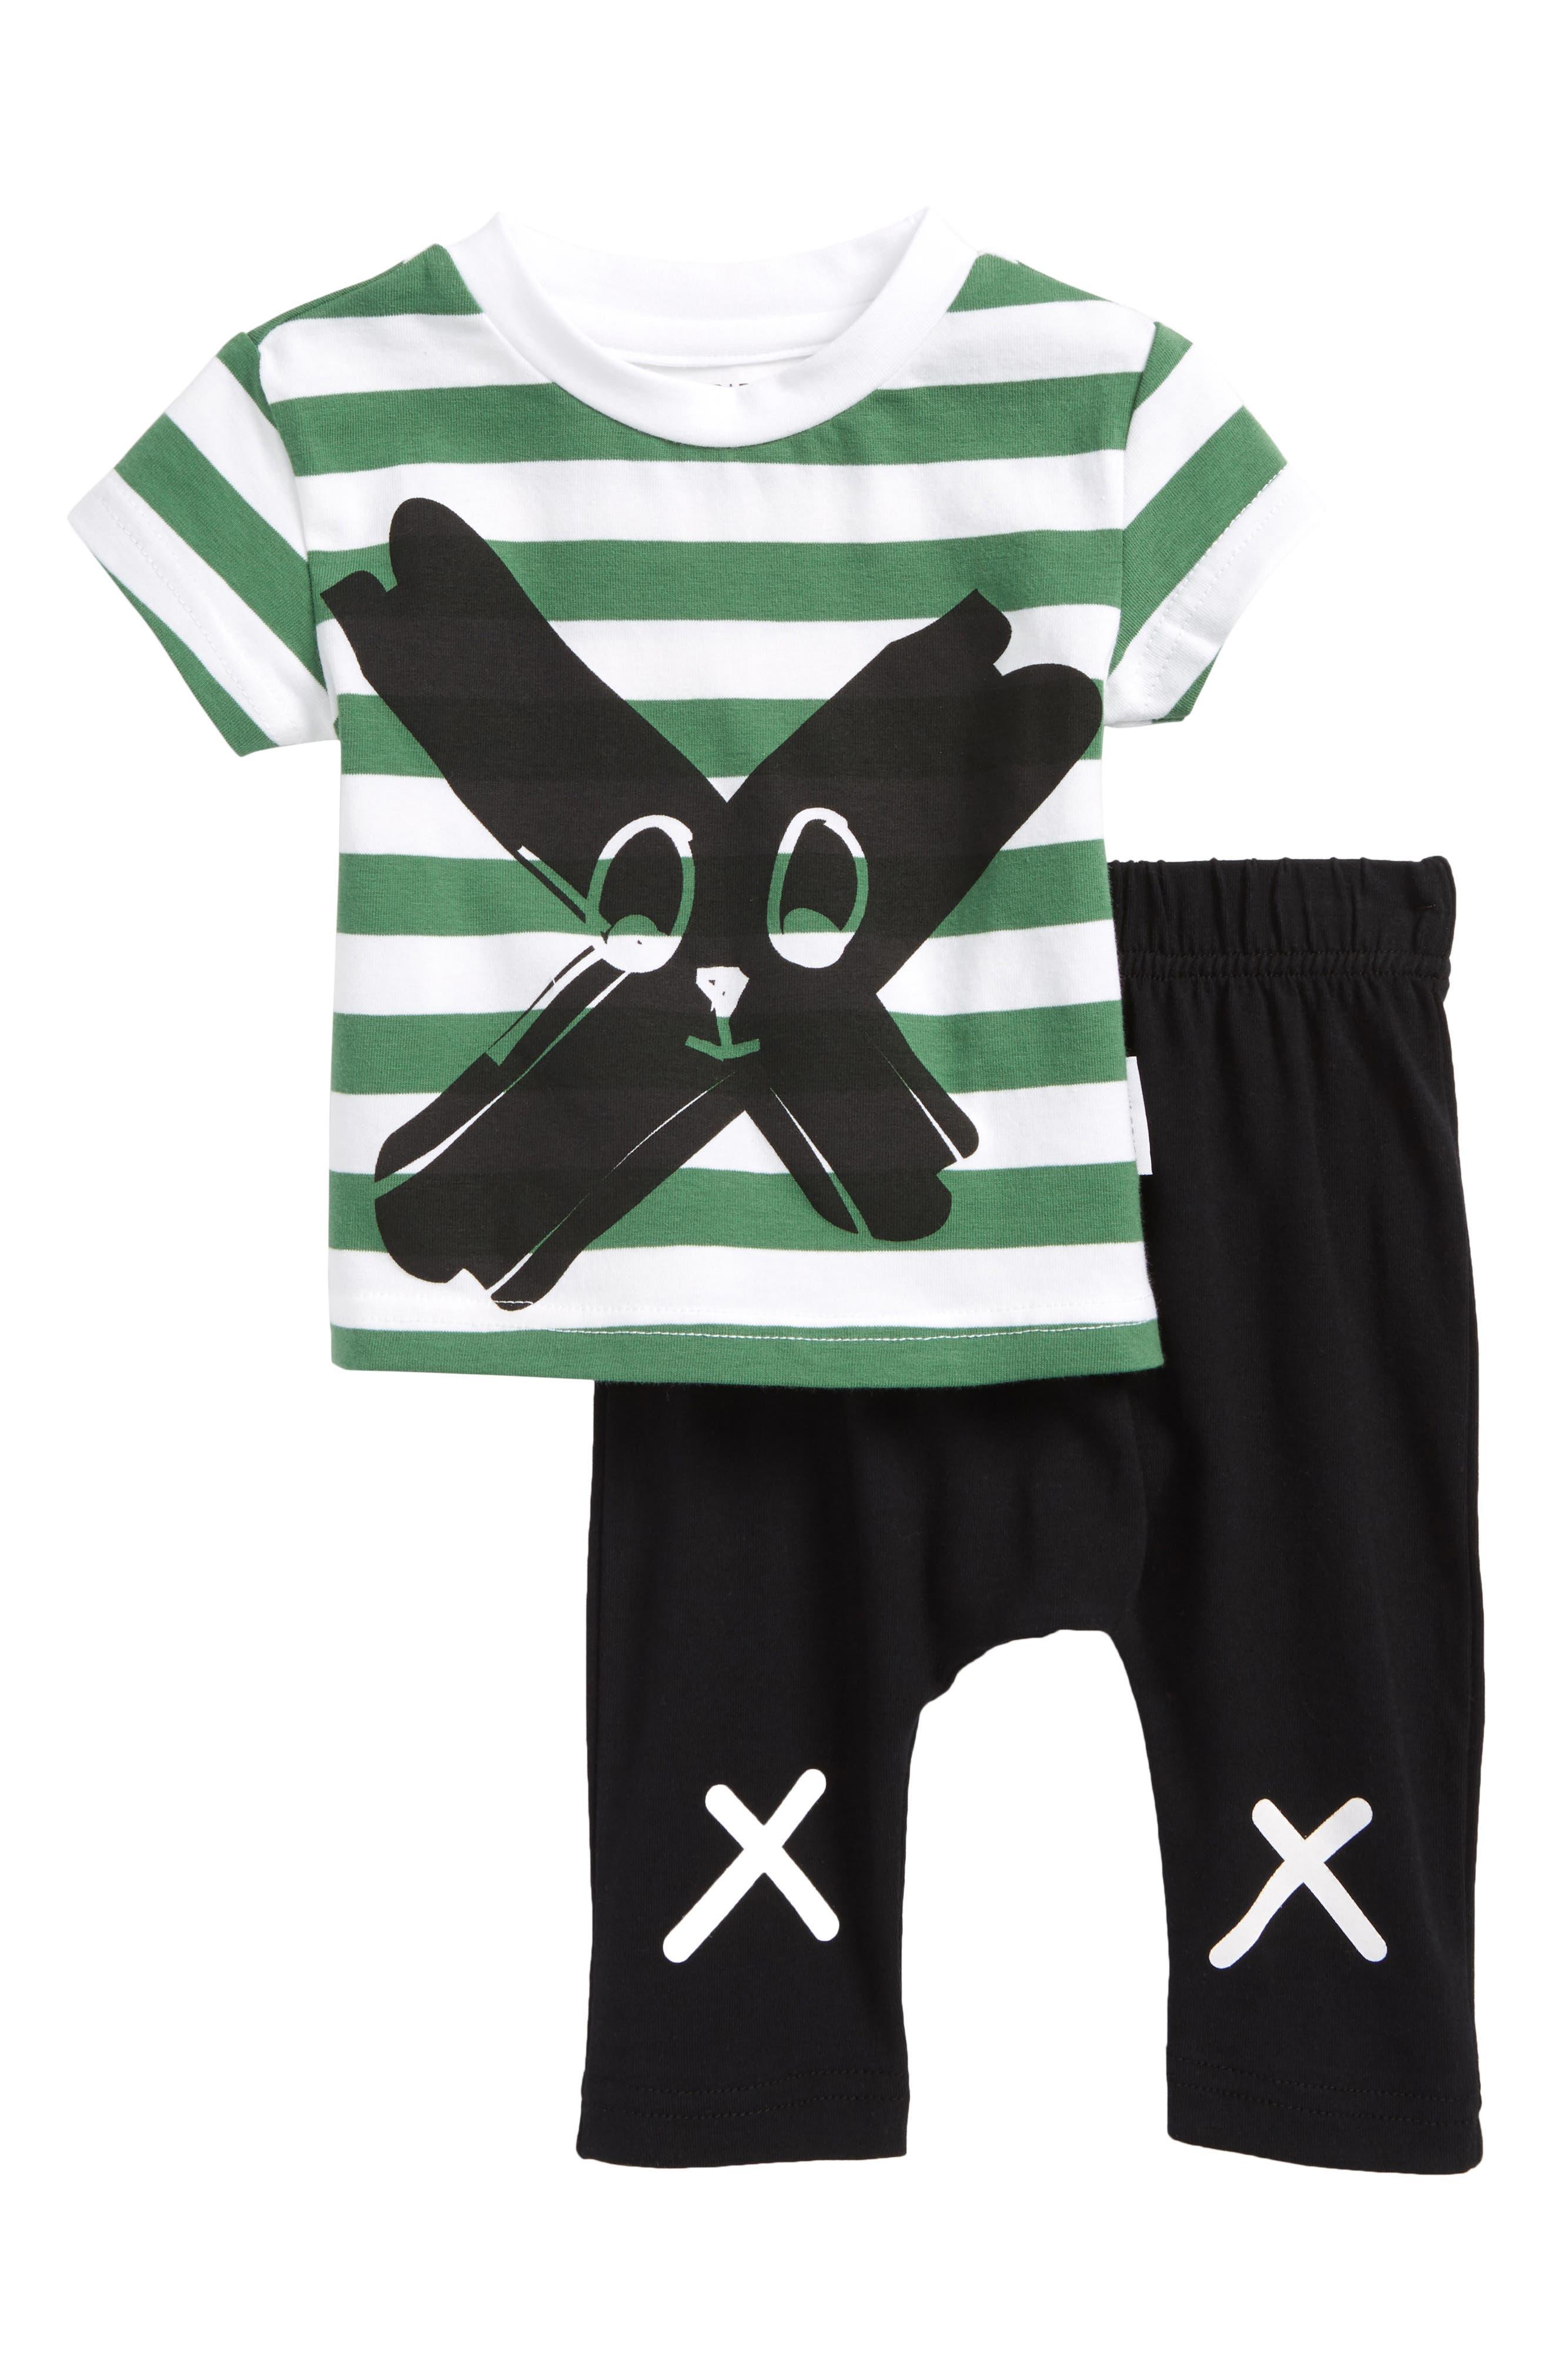 Main Image - Tiny Tribe Face Paint T-Shirt & Pants Set (Baby)